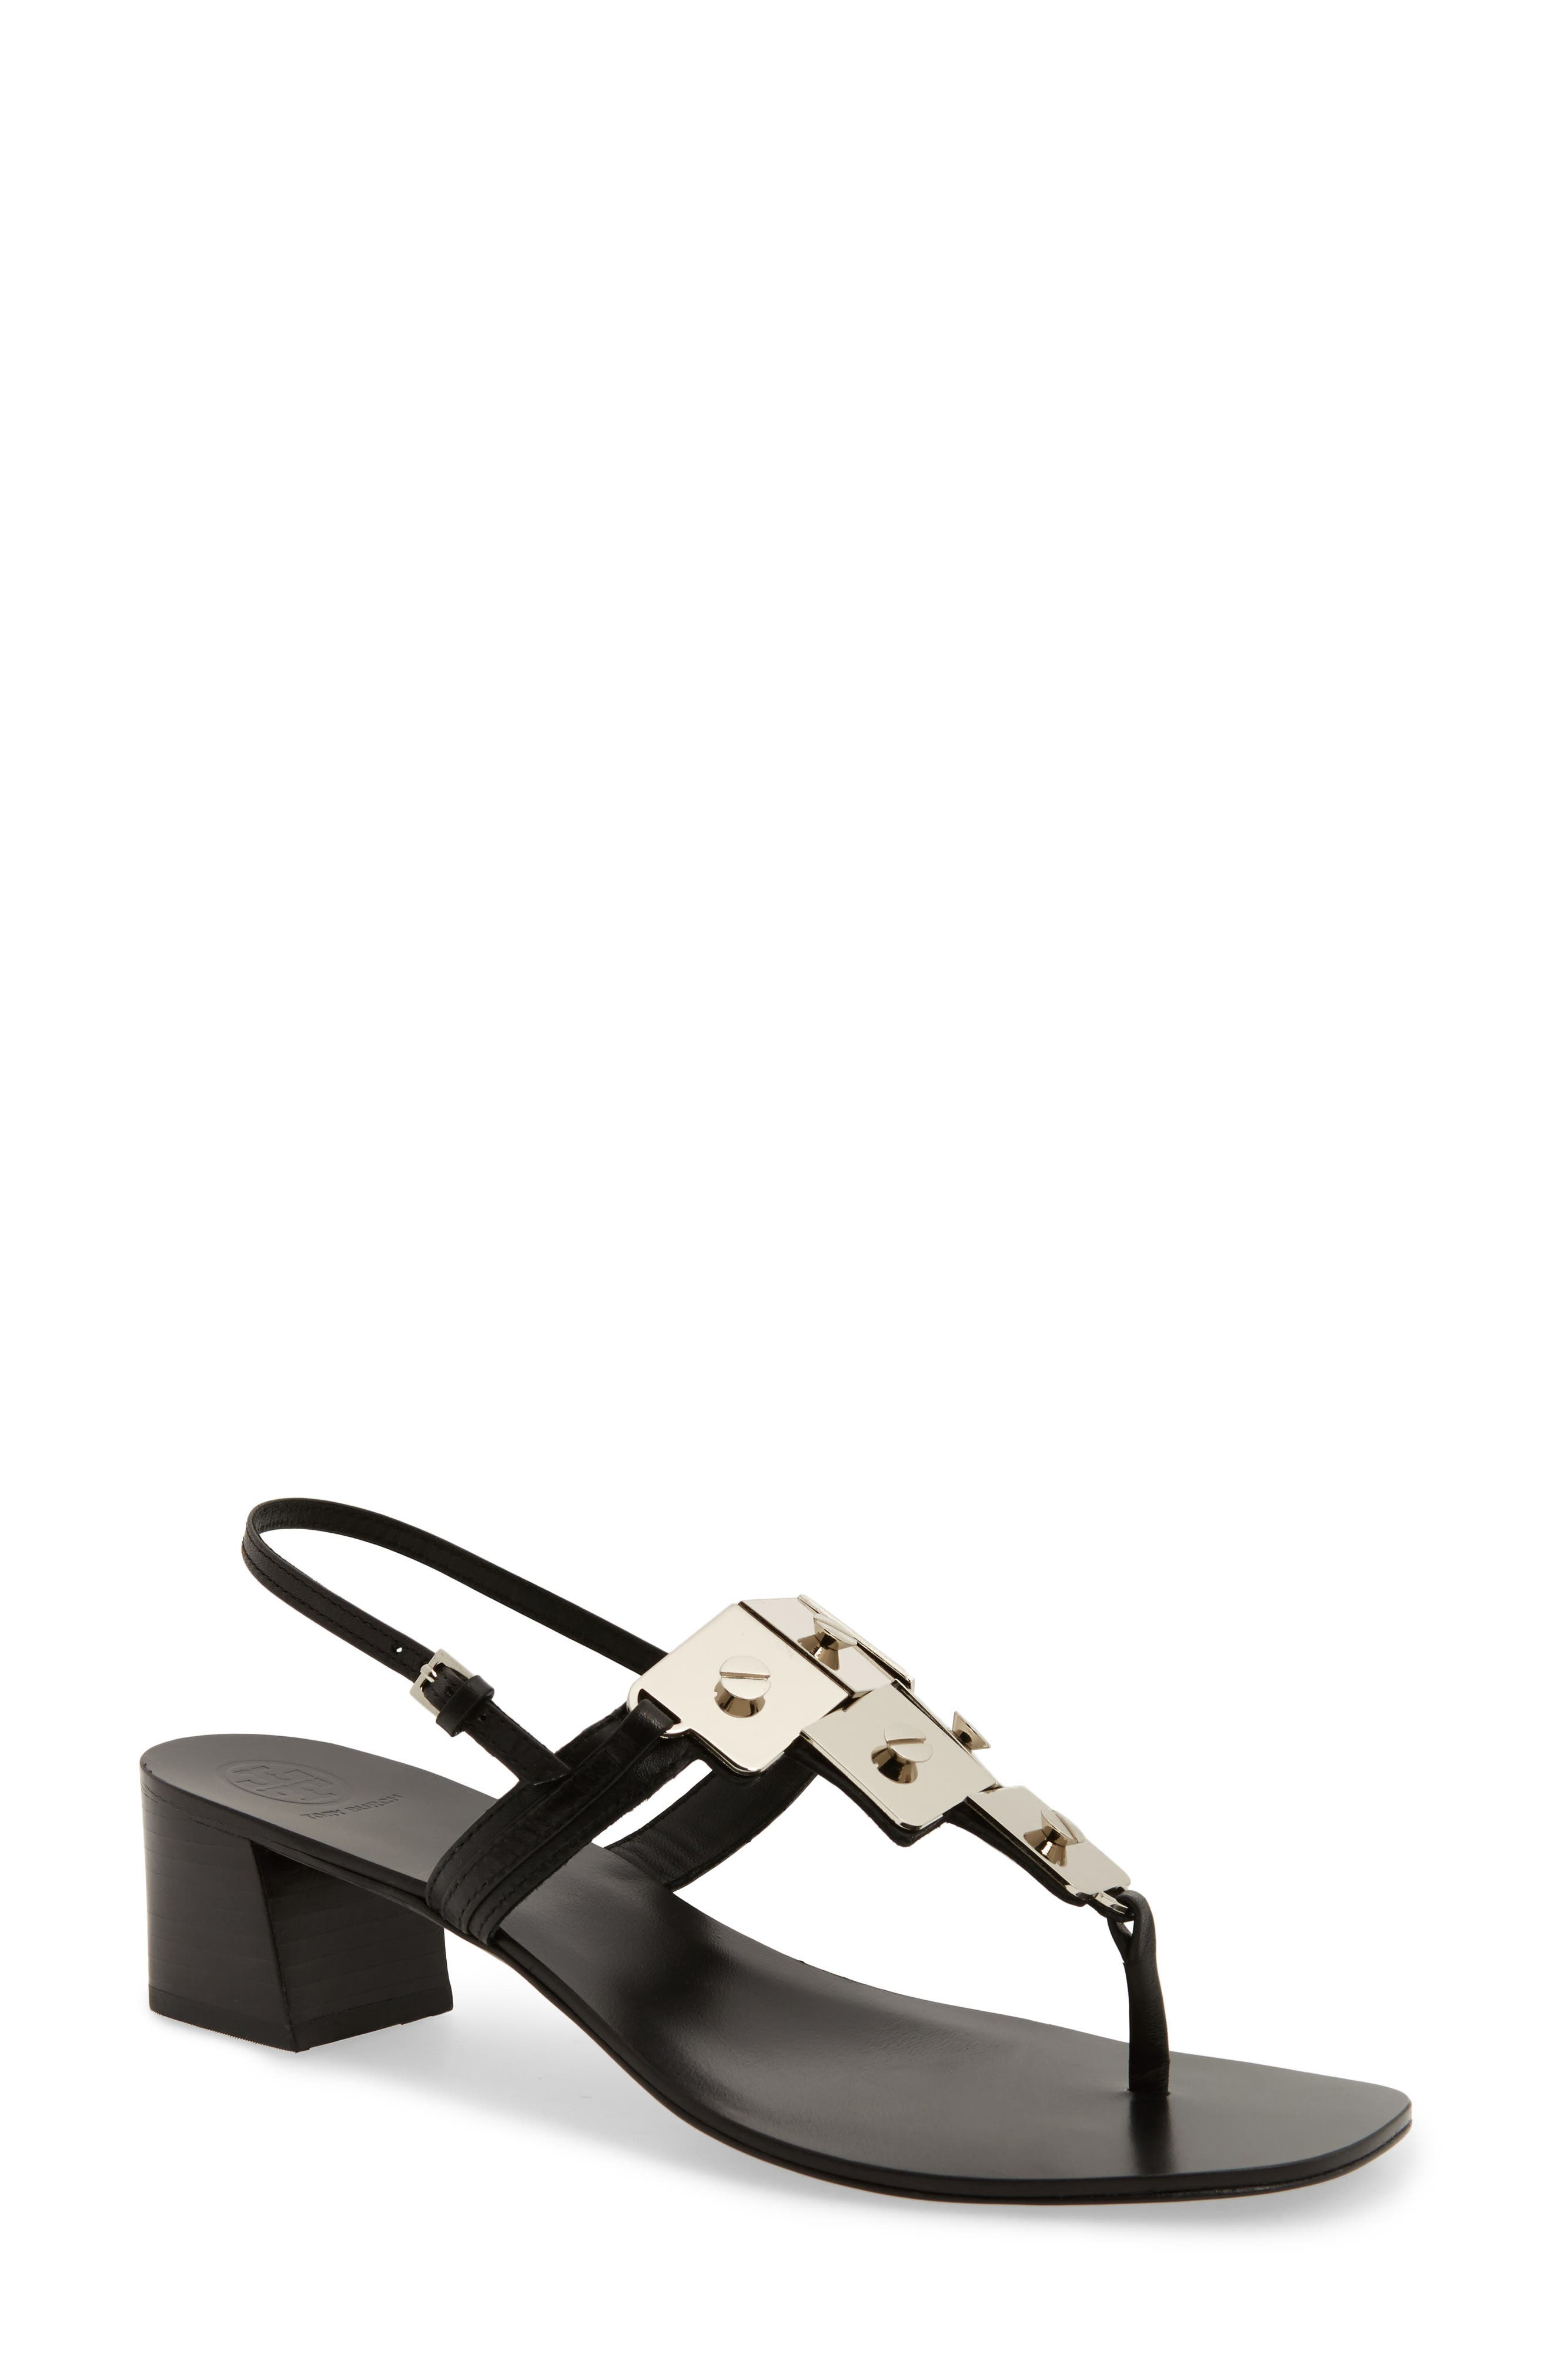 Thompson Sandal,                         Main,                         color, 006